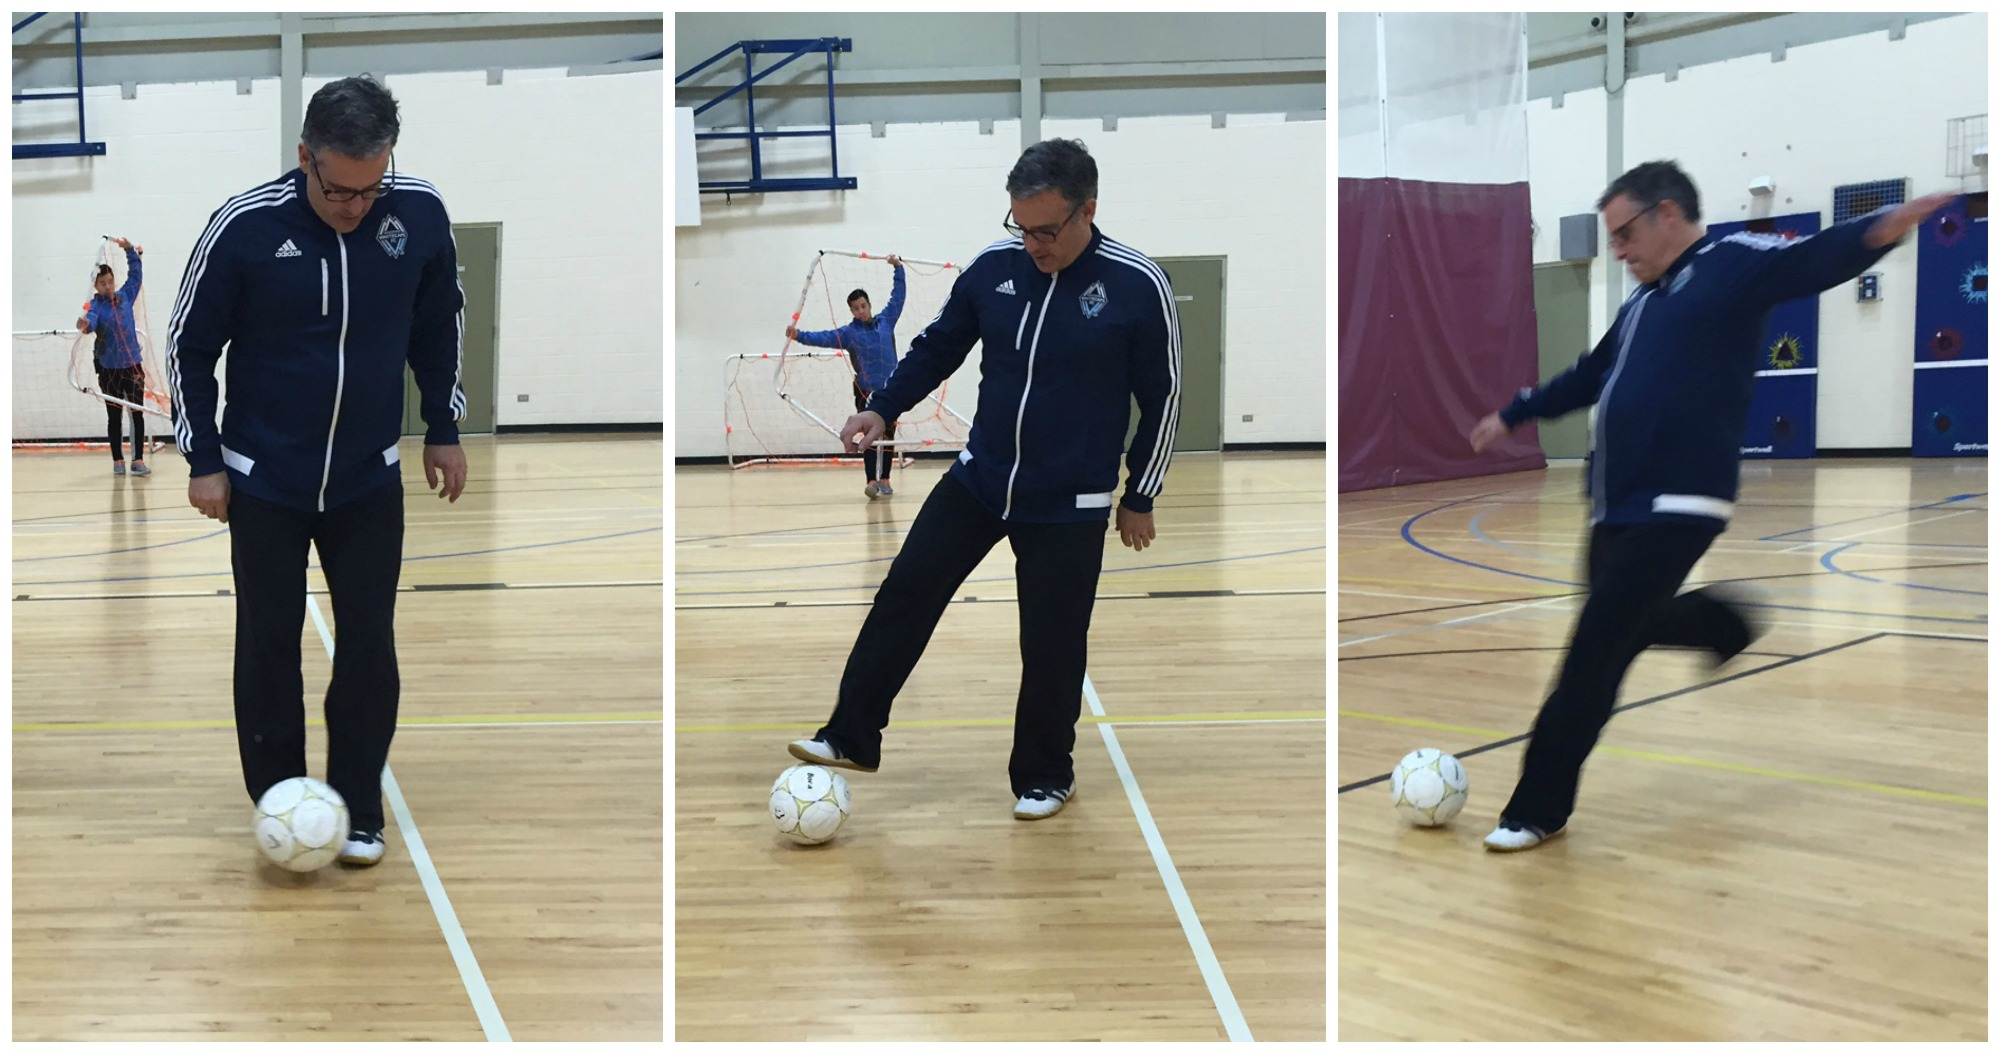 Soccer Practice Pains